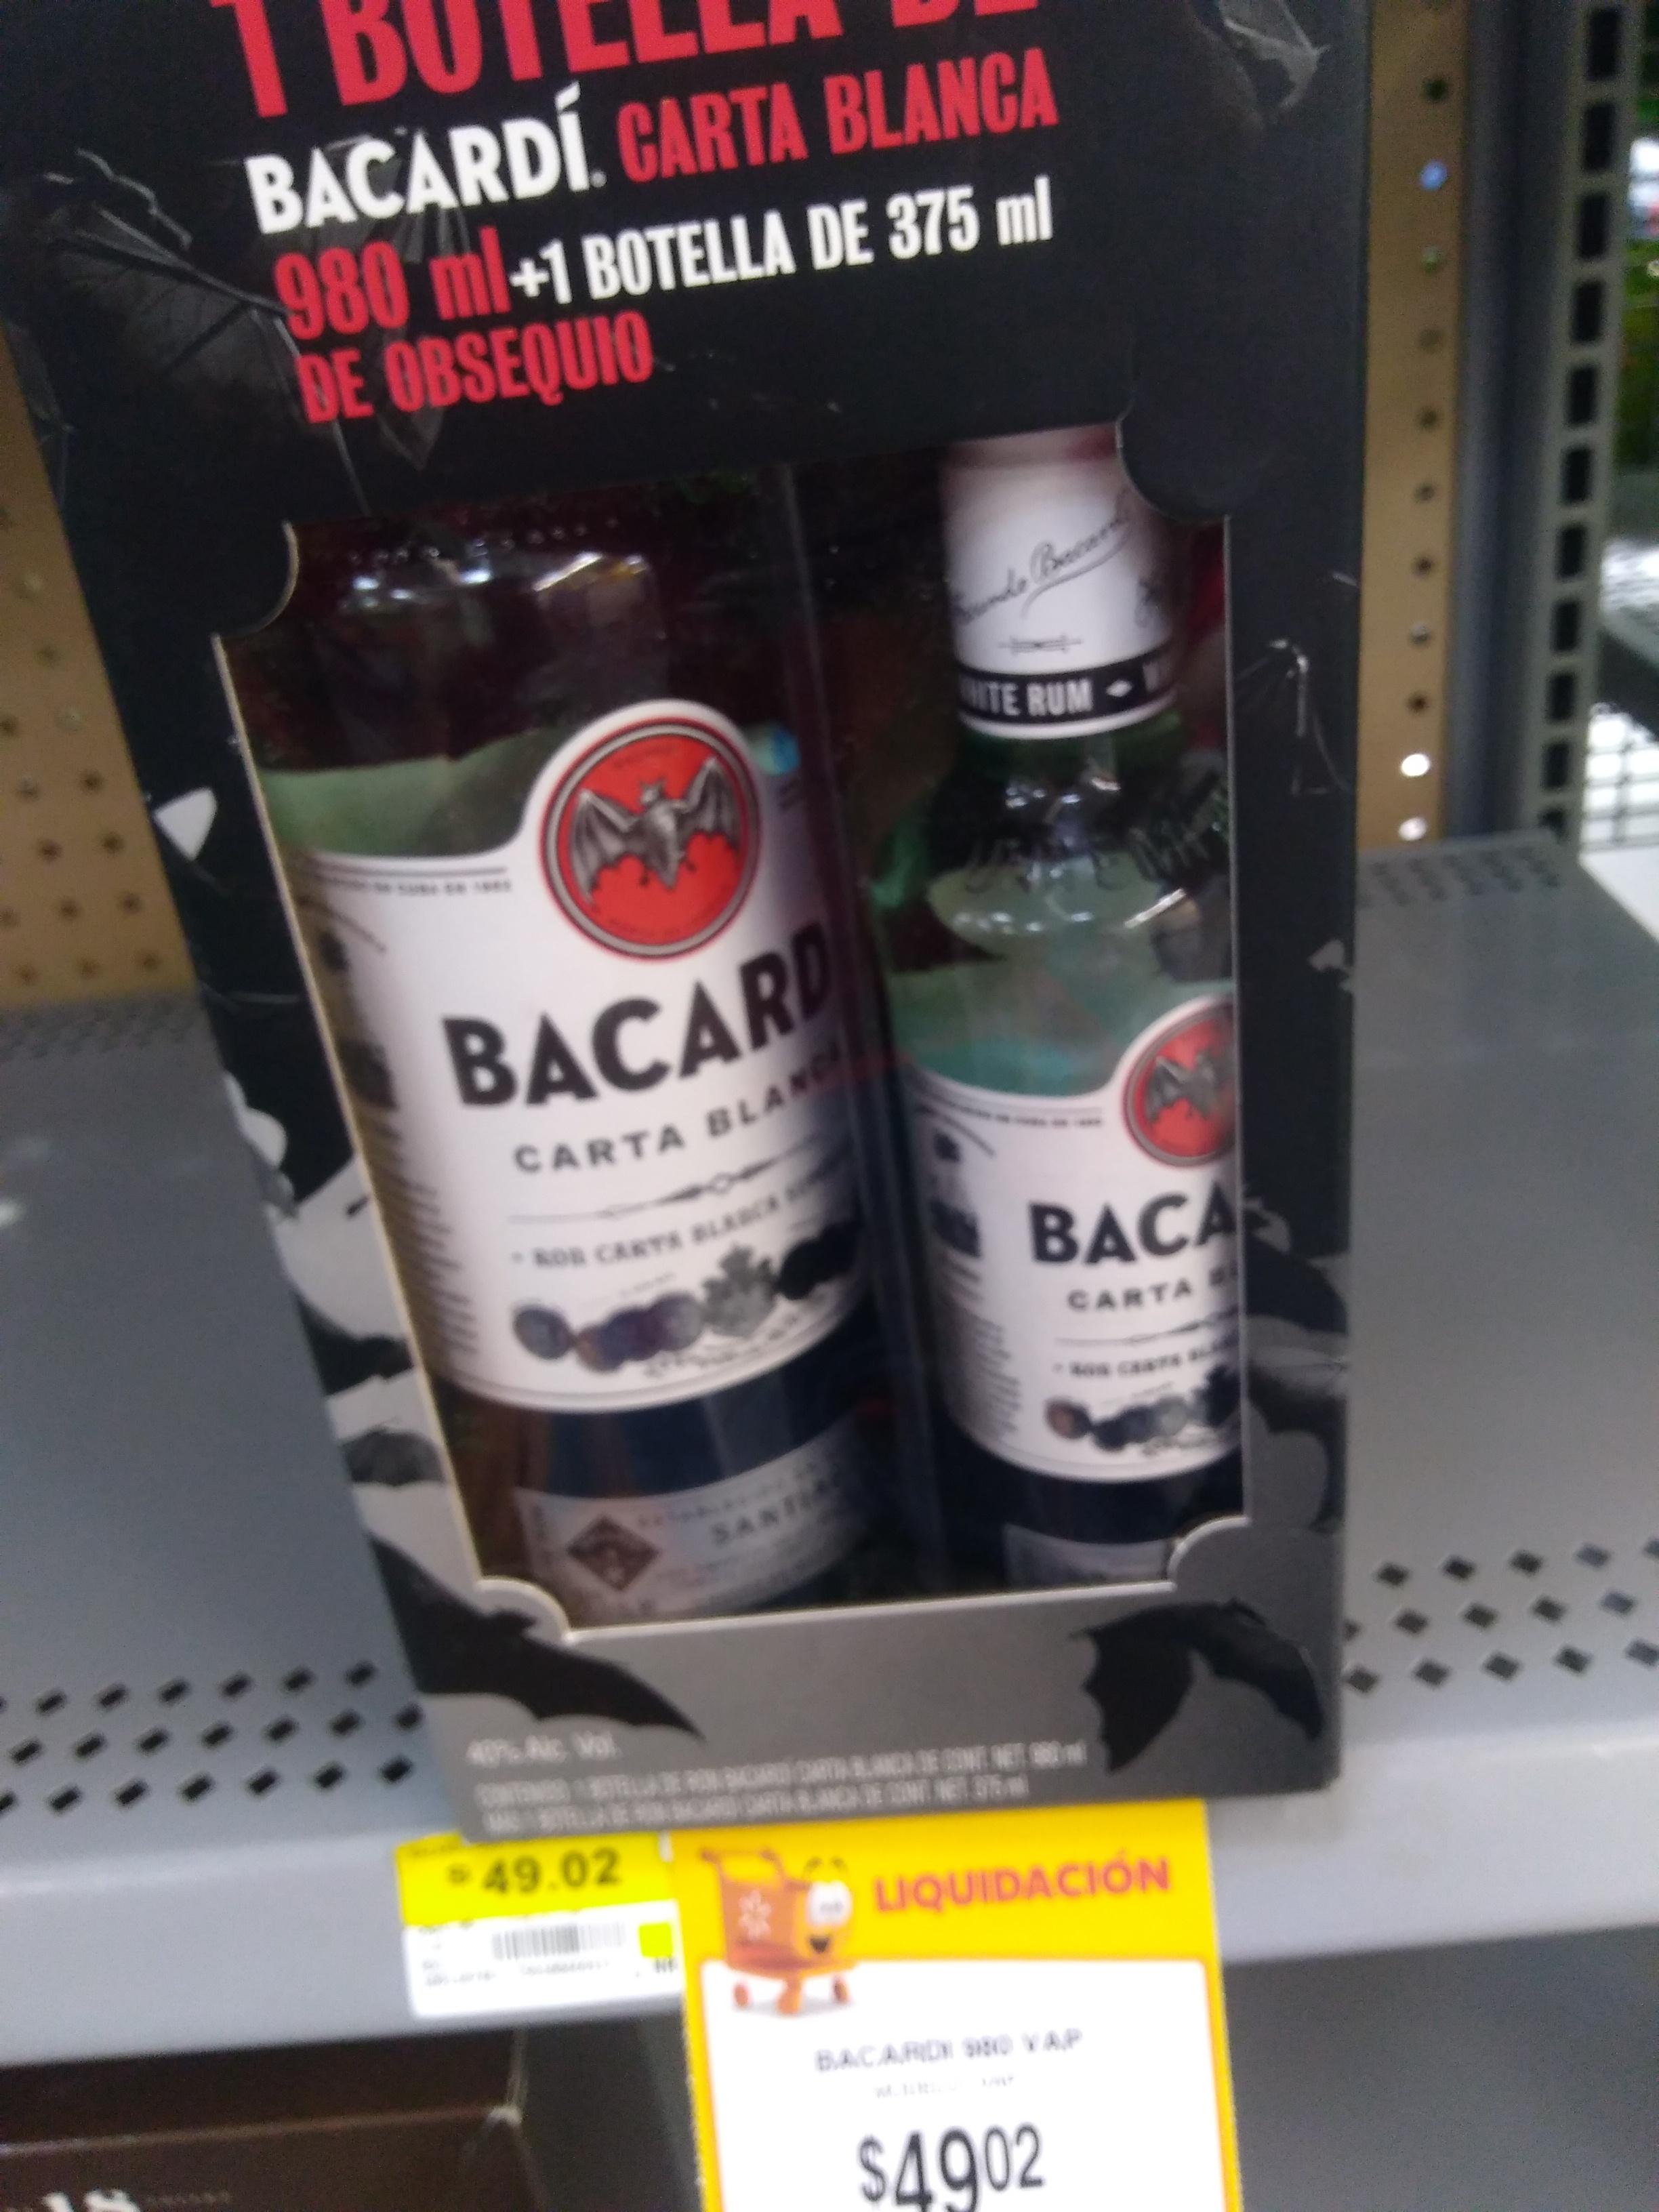 Walmart Zacatecas Bacardi un litro con Panchita de 375 militros a $49.02